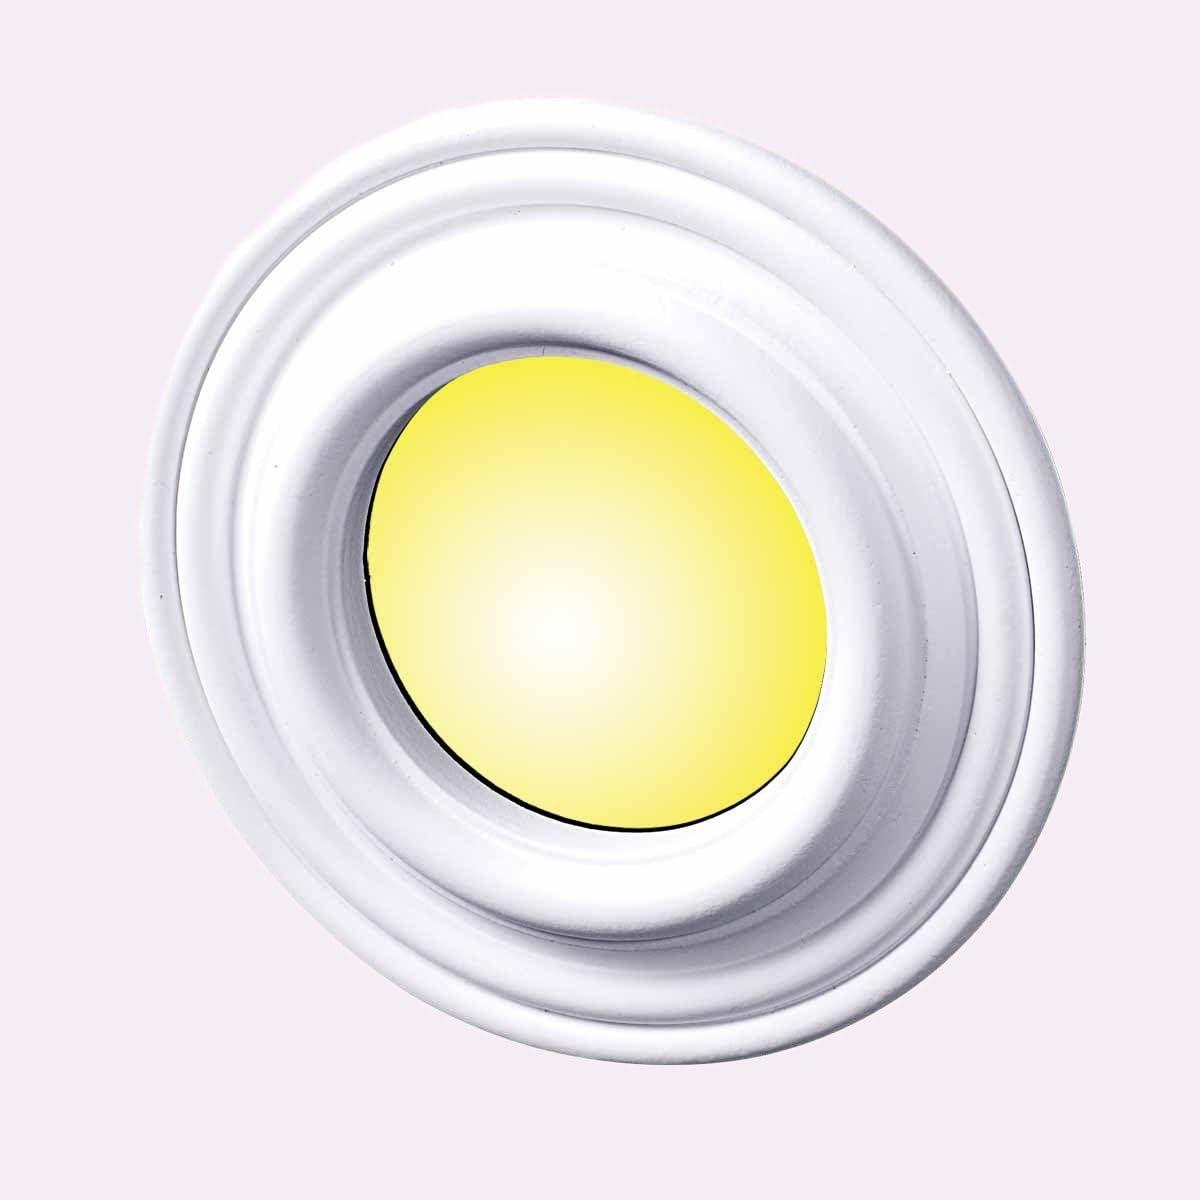 Recessed Lighting Ceiling Trim For Spot Lights In Bedroom Kitchen Etc White Durable Urethane Foam 5 Inch Inner Diameter X 9 Inch Outer Diameter Classy Round Medallion